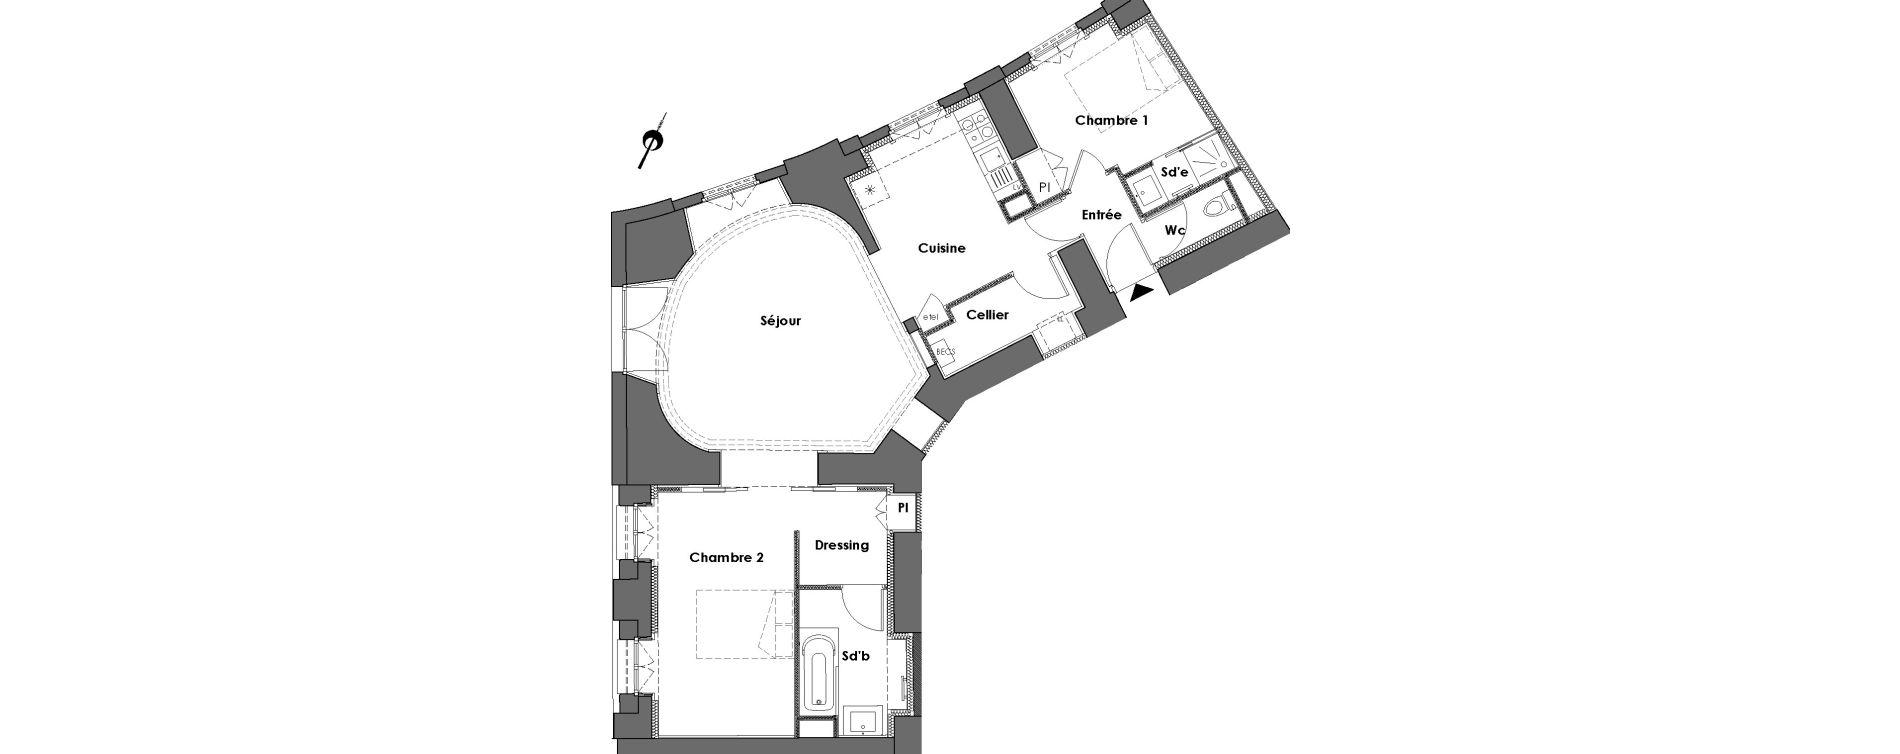 Appartement T3 de 75,36 m2 à Nantes Dobree